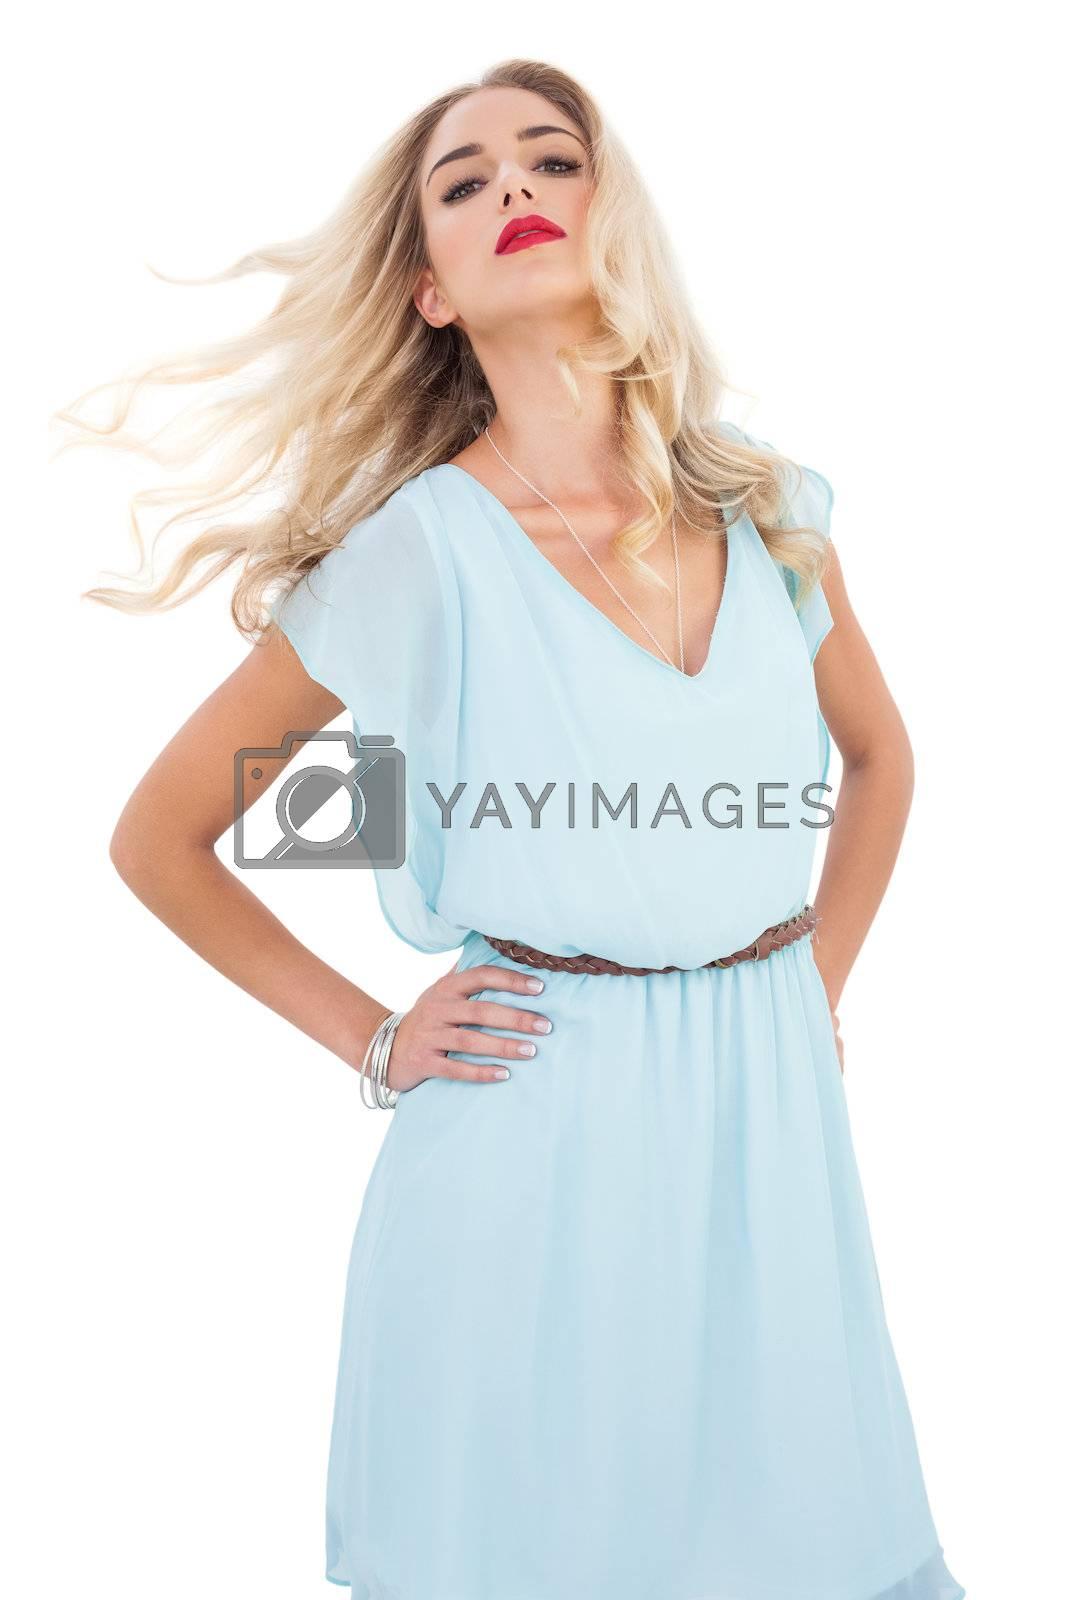 Attractive blonde model in blue dress posing shaking her hair by Wavebreakmedia